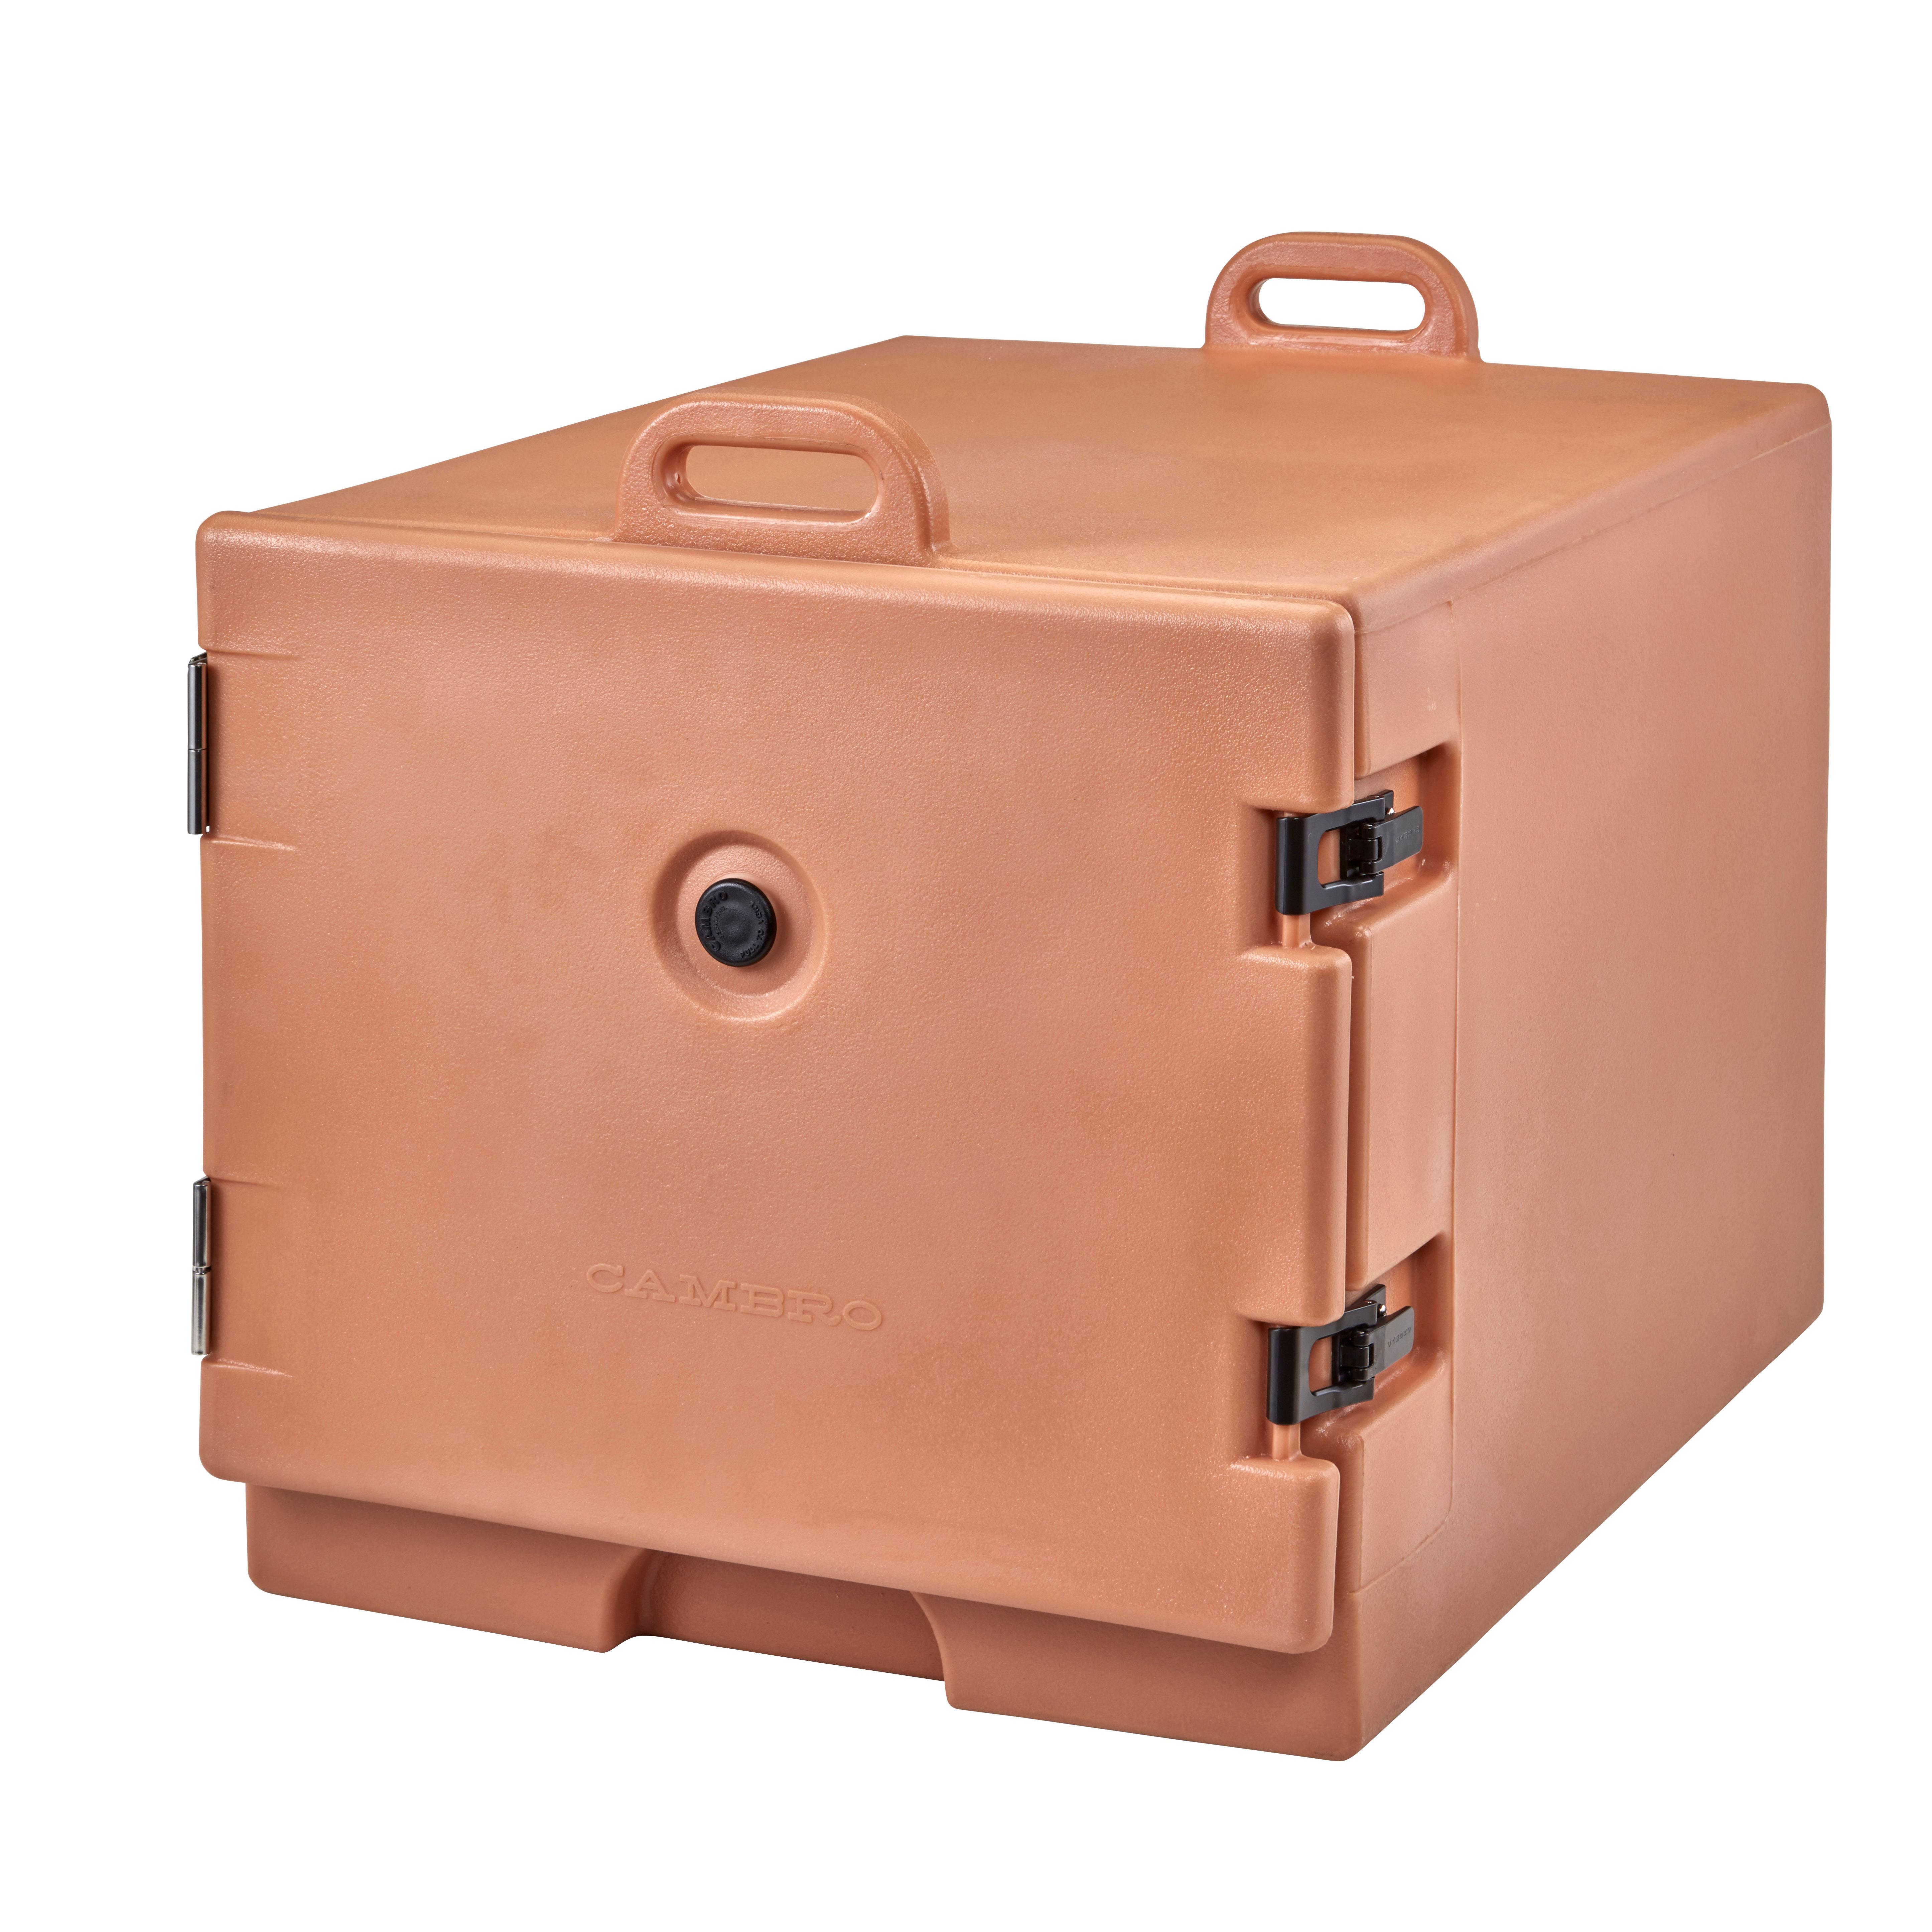 Cambro 1826MTC157 insulated food storage